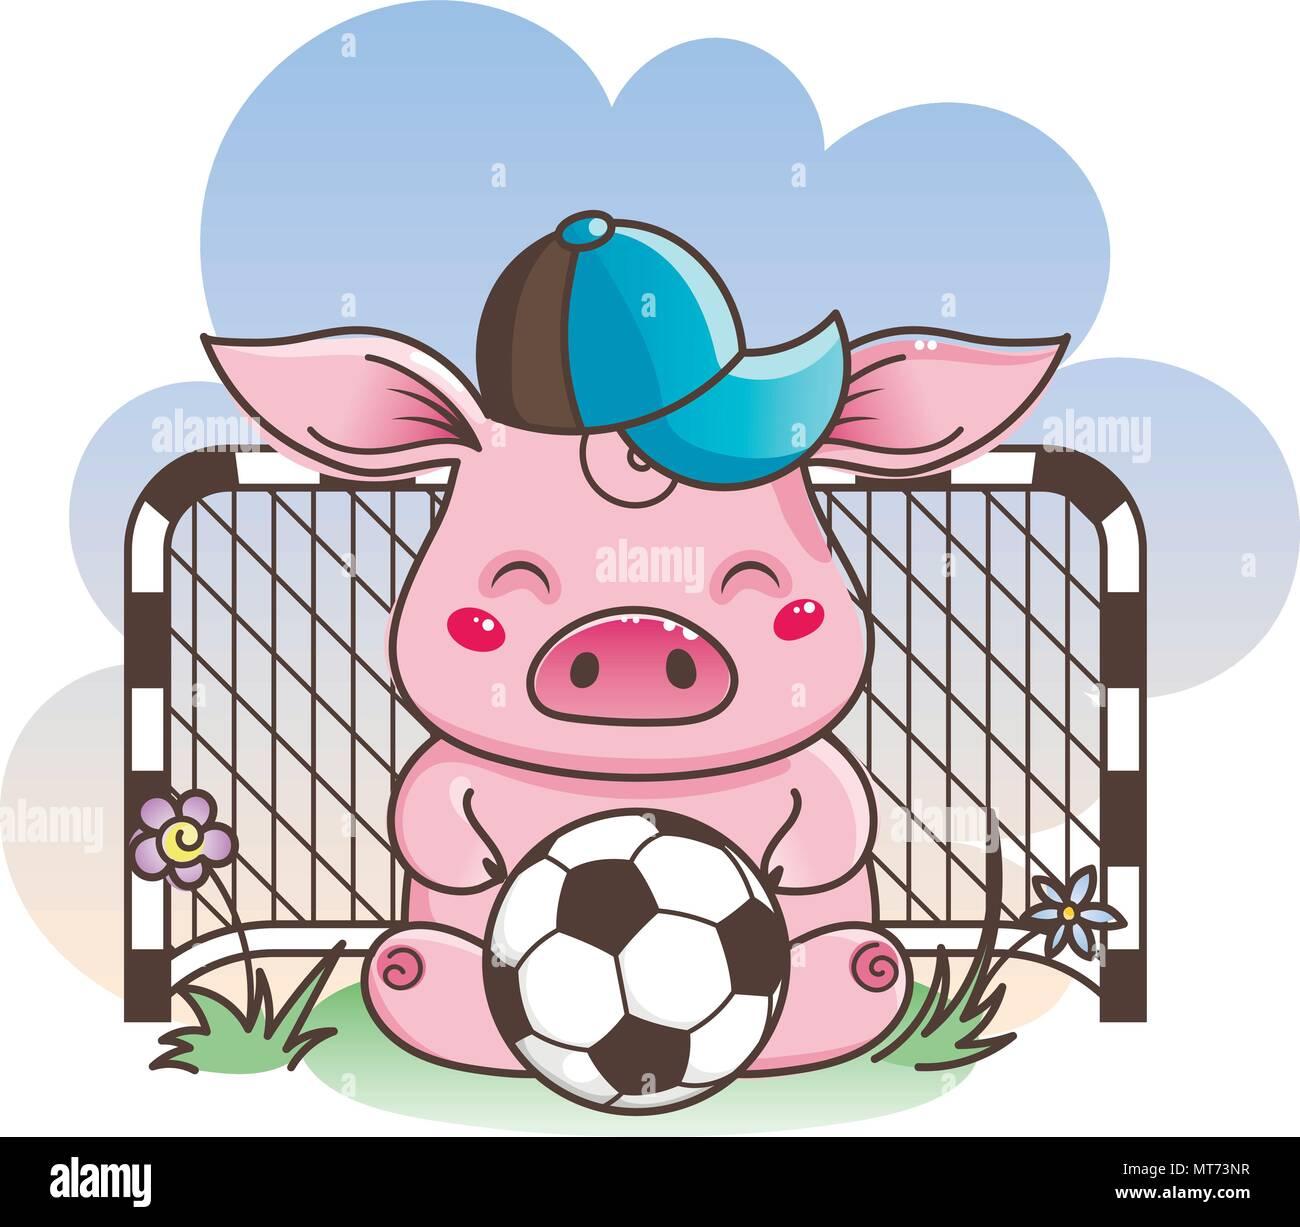 Cute cartoon pig with a soccer ball. Vector illustration. Baby animal art - Stock Vector